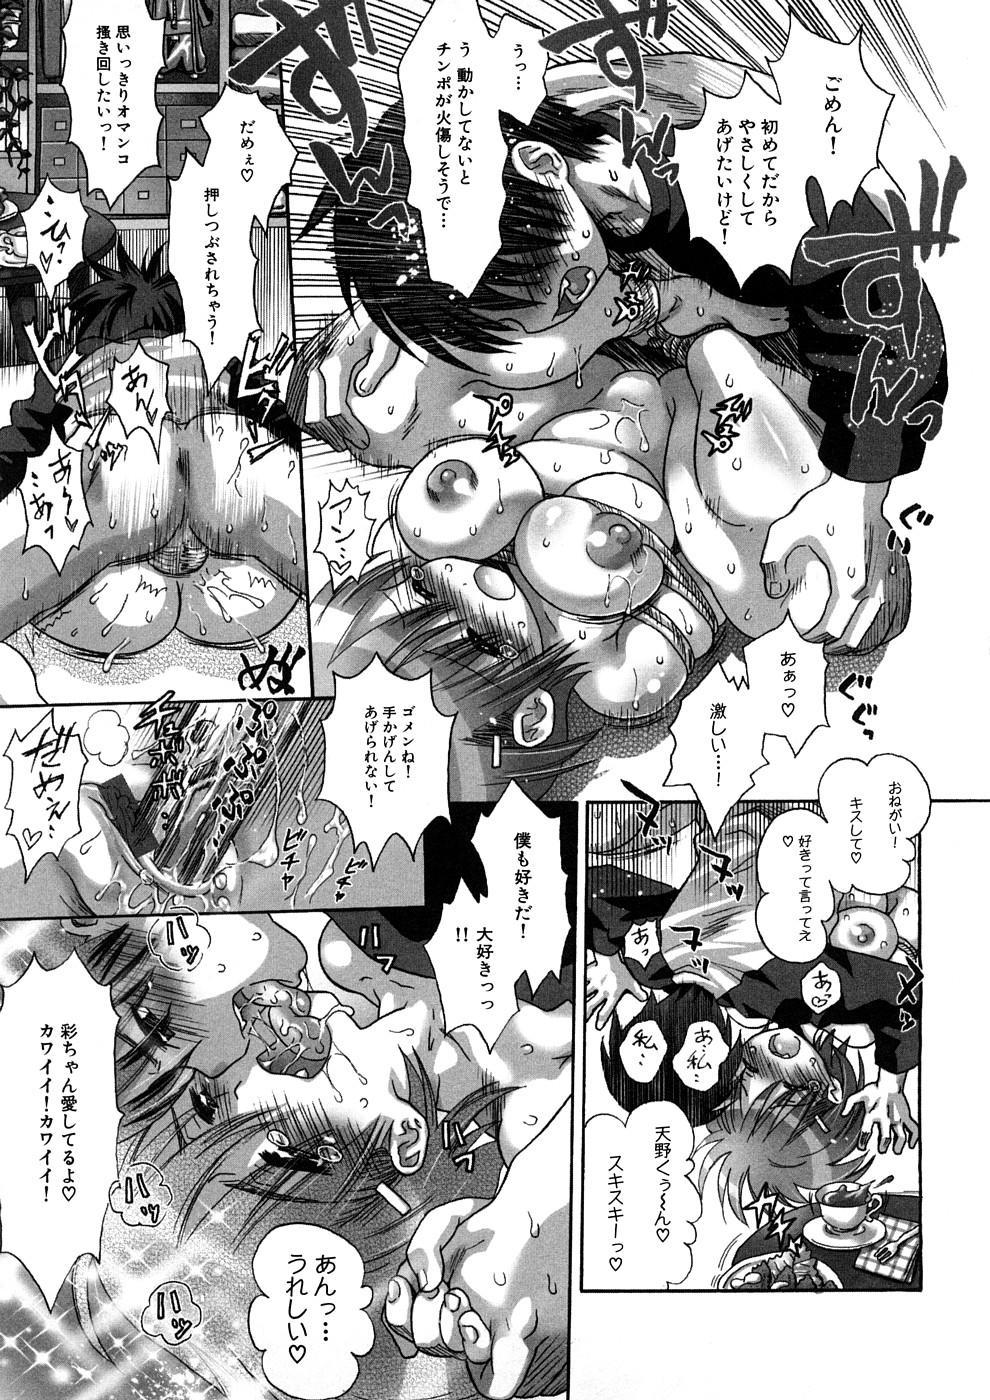 Geki Yaba Anthology Vol. 1 - Naka ni Dashite yo 113